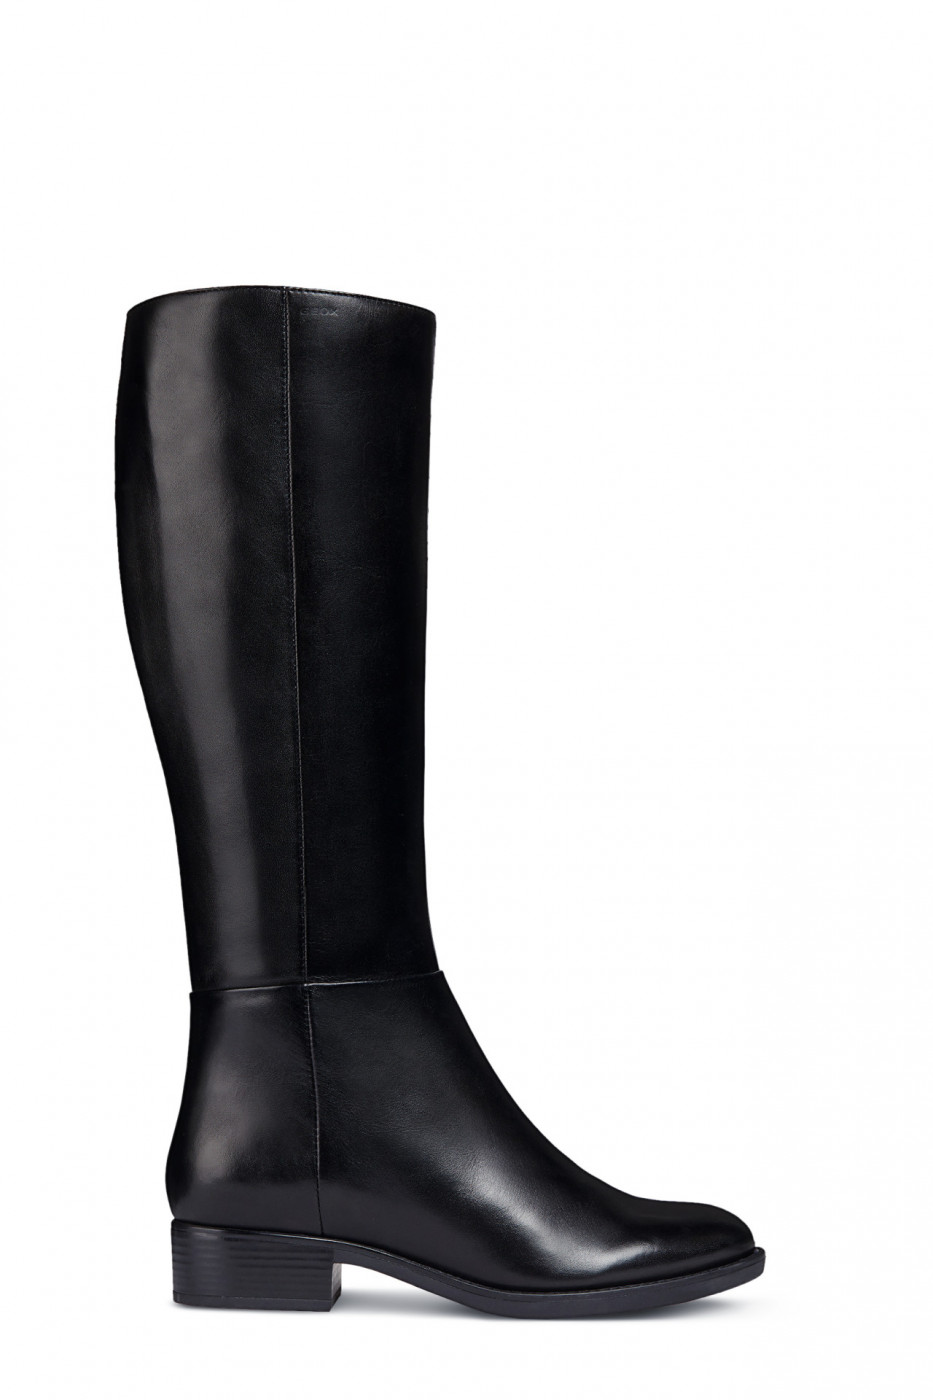 Women's boots GEOX FELICITY E